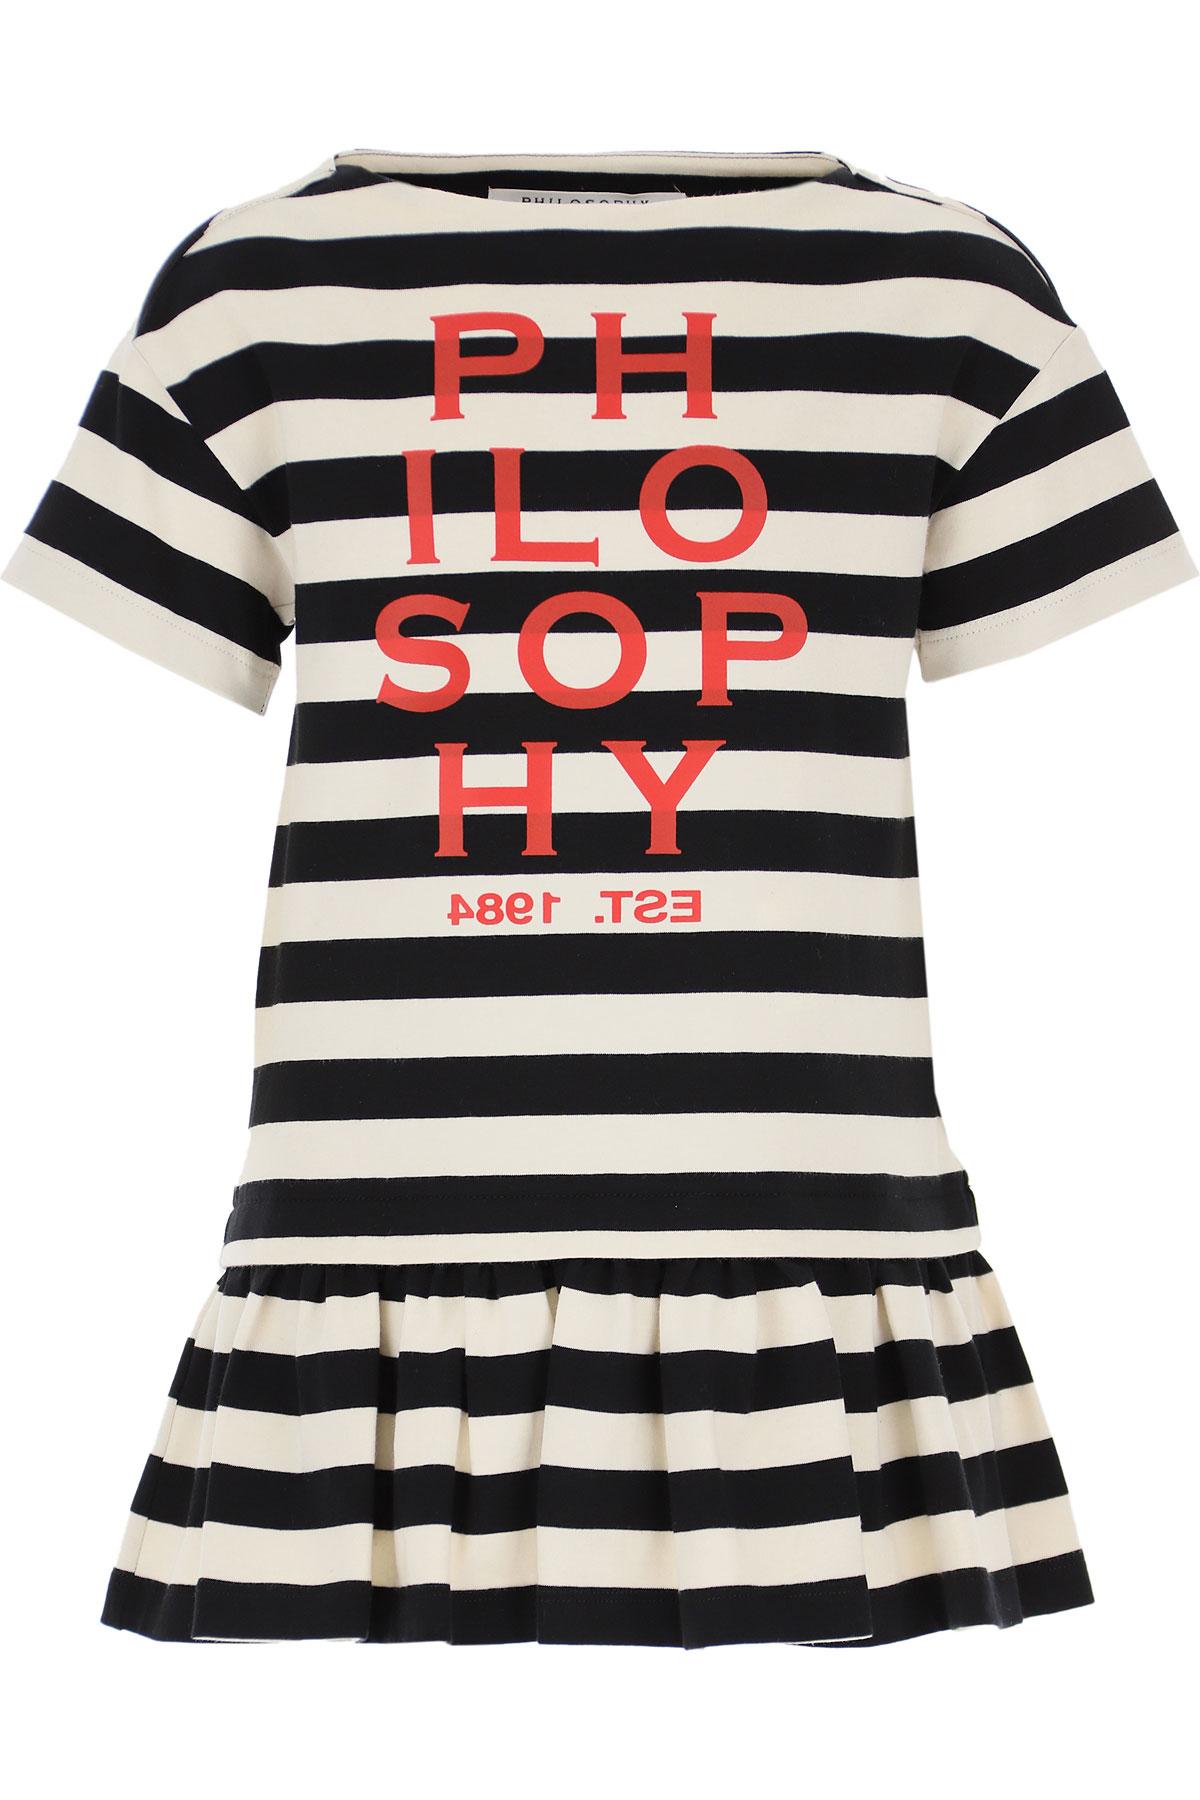 Philosophy di Lorenzo Serafini Girls Dress On Sale, Black, Cotton, 2019, L S XL XS